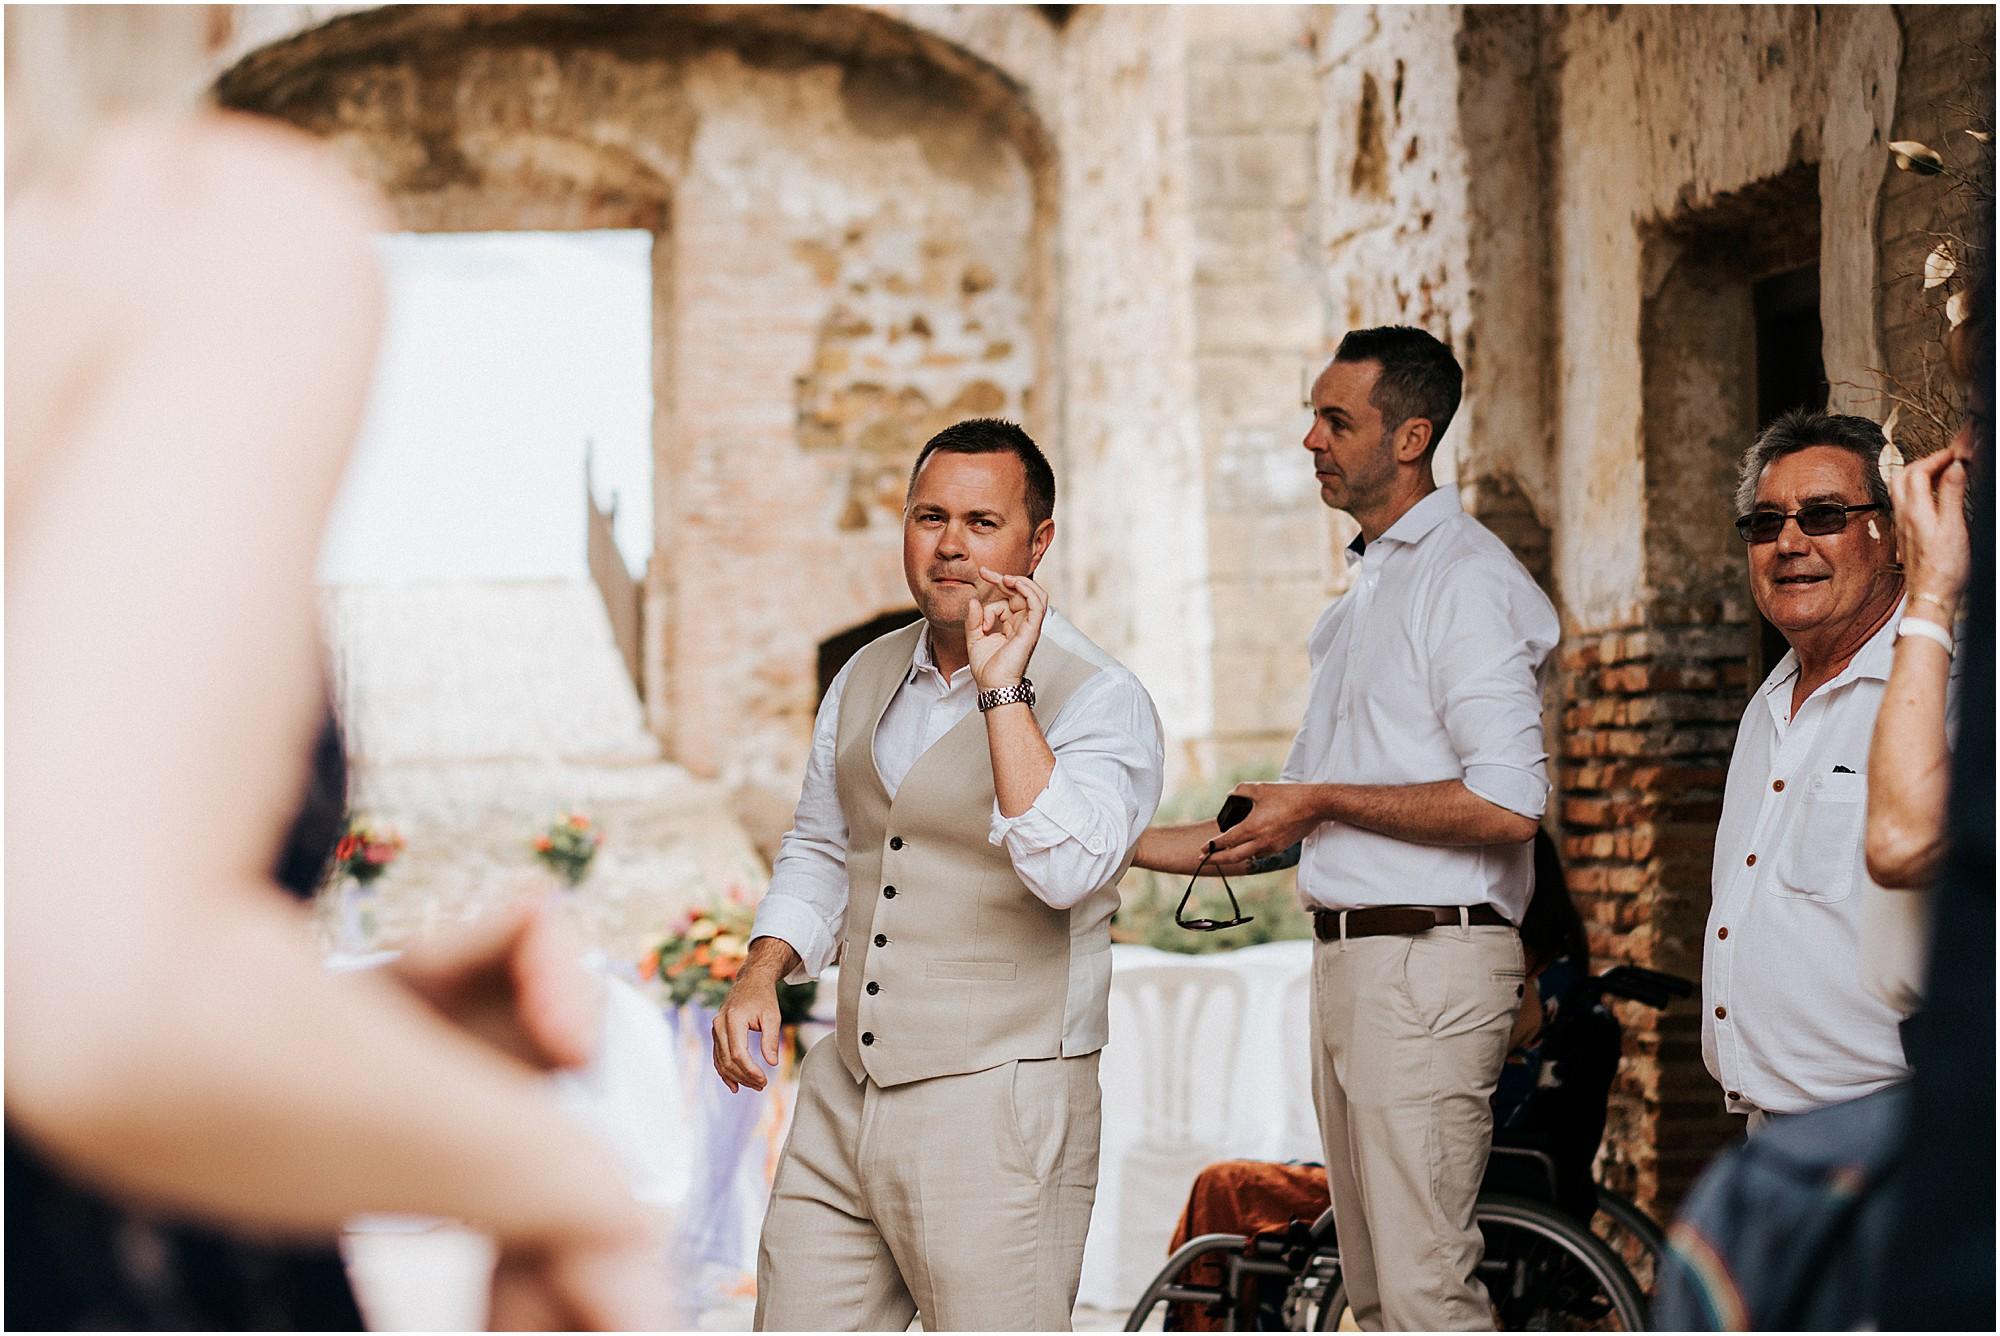 Cheshire Wedding Photography - Castillo Duquesa, Spain